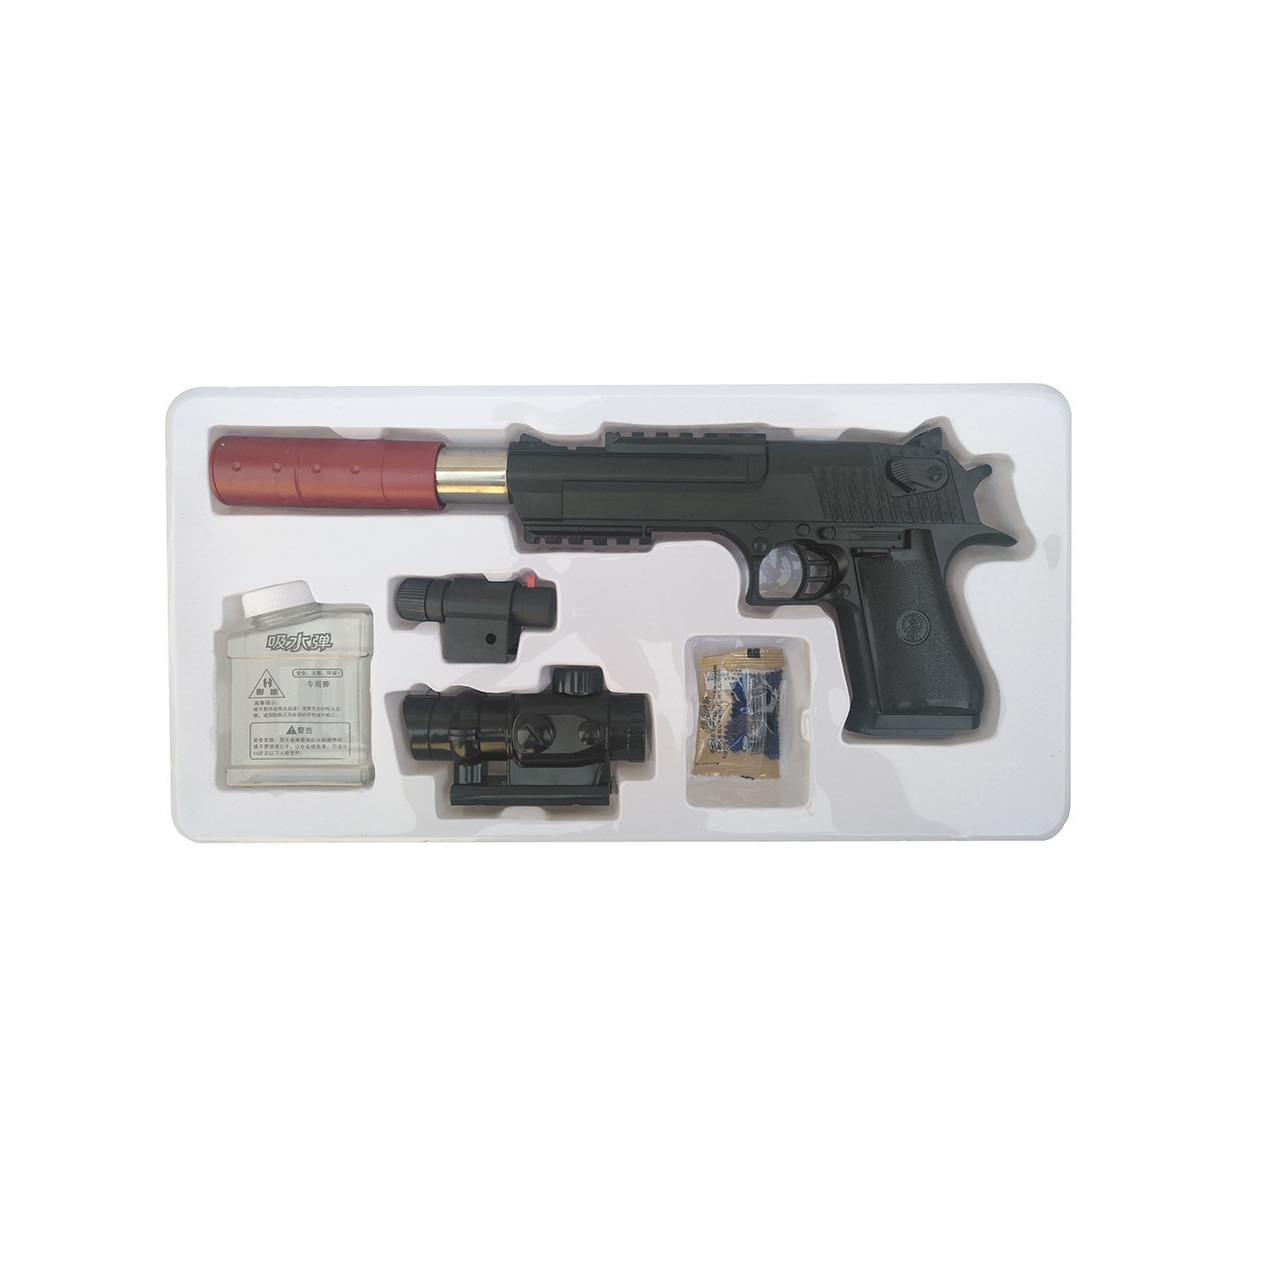 تفنگ اسباب بازی مدل DESERT EAGLE کد H1A